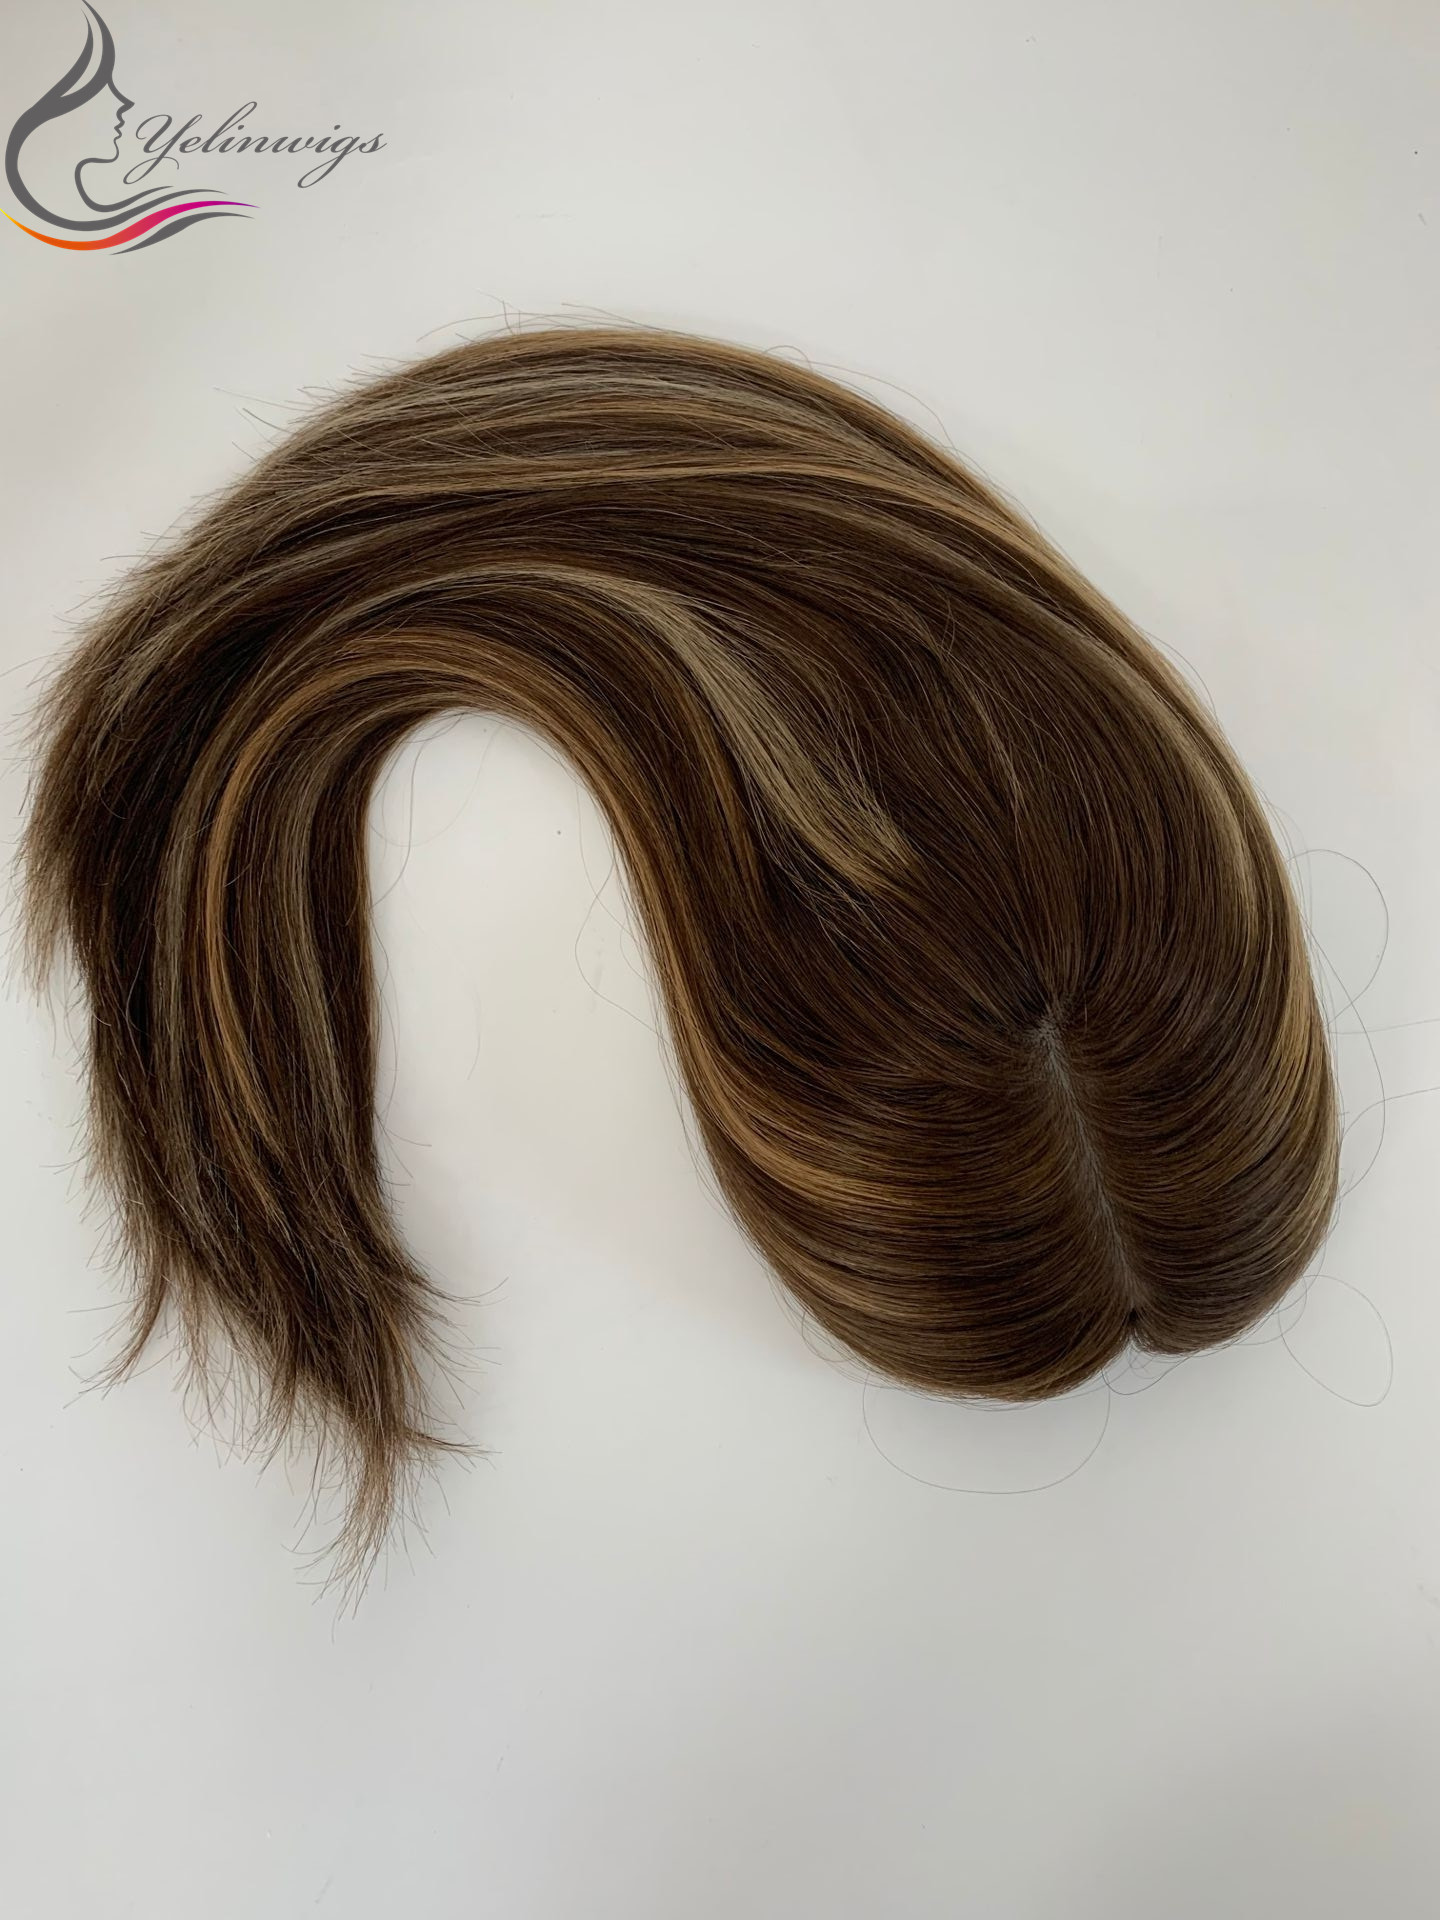 Ht Sale European Virgin Hair Topper Women Hair Pieces Best Selling Kippah Fall Whopper